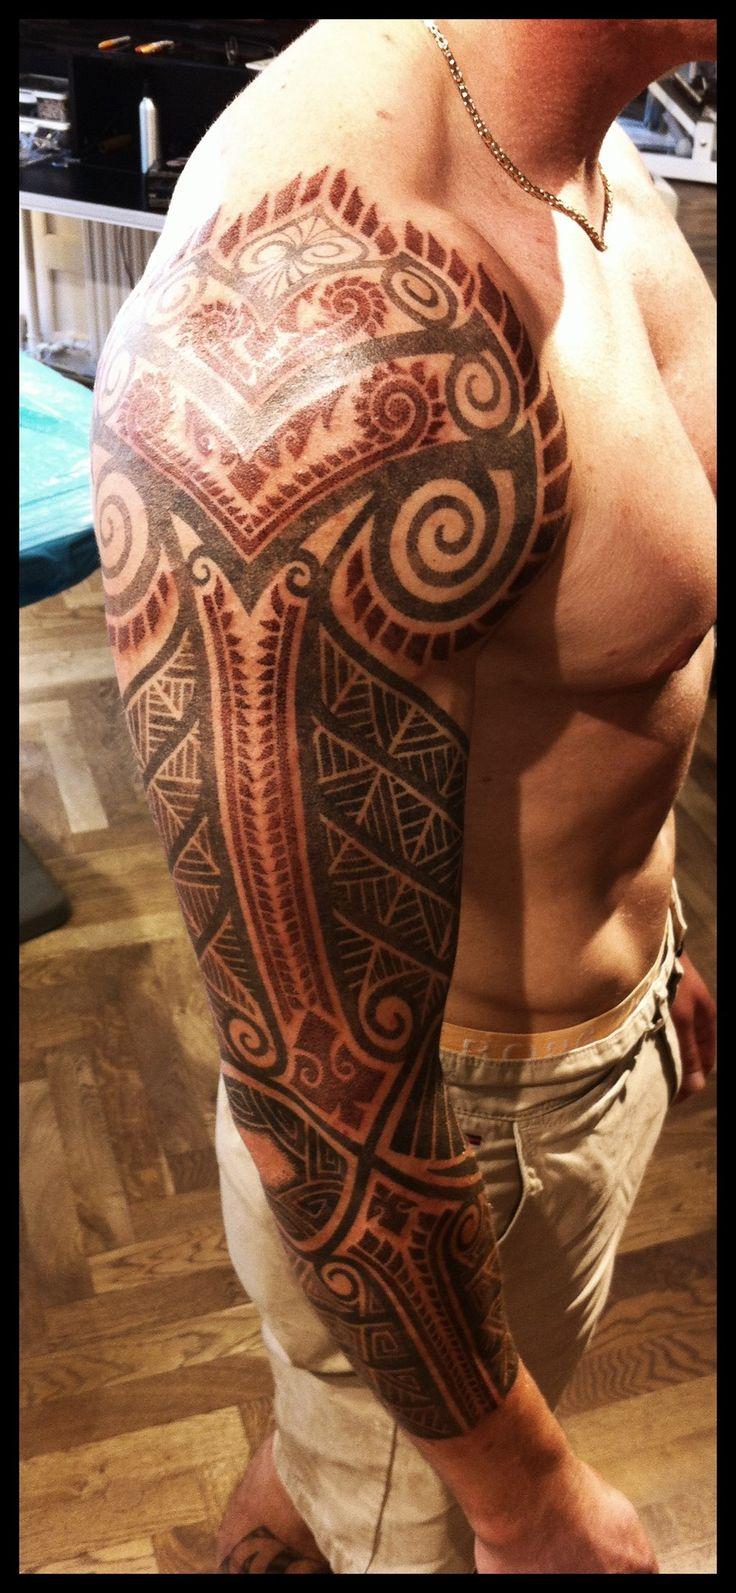 Celtic and bali inspired sleeve by Meatshop-Tattoo.deviantart.com on @deviantART